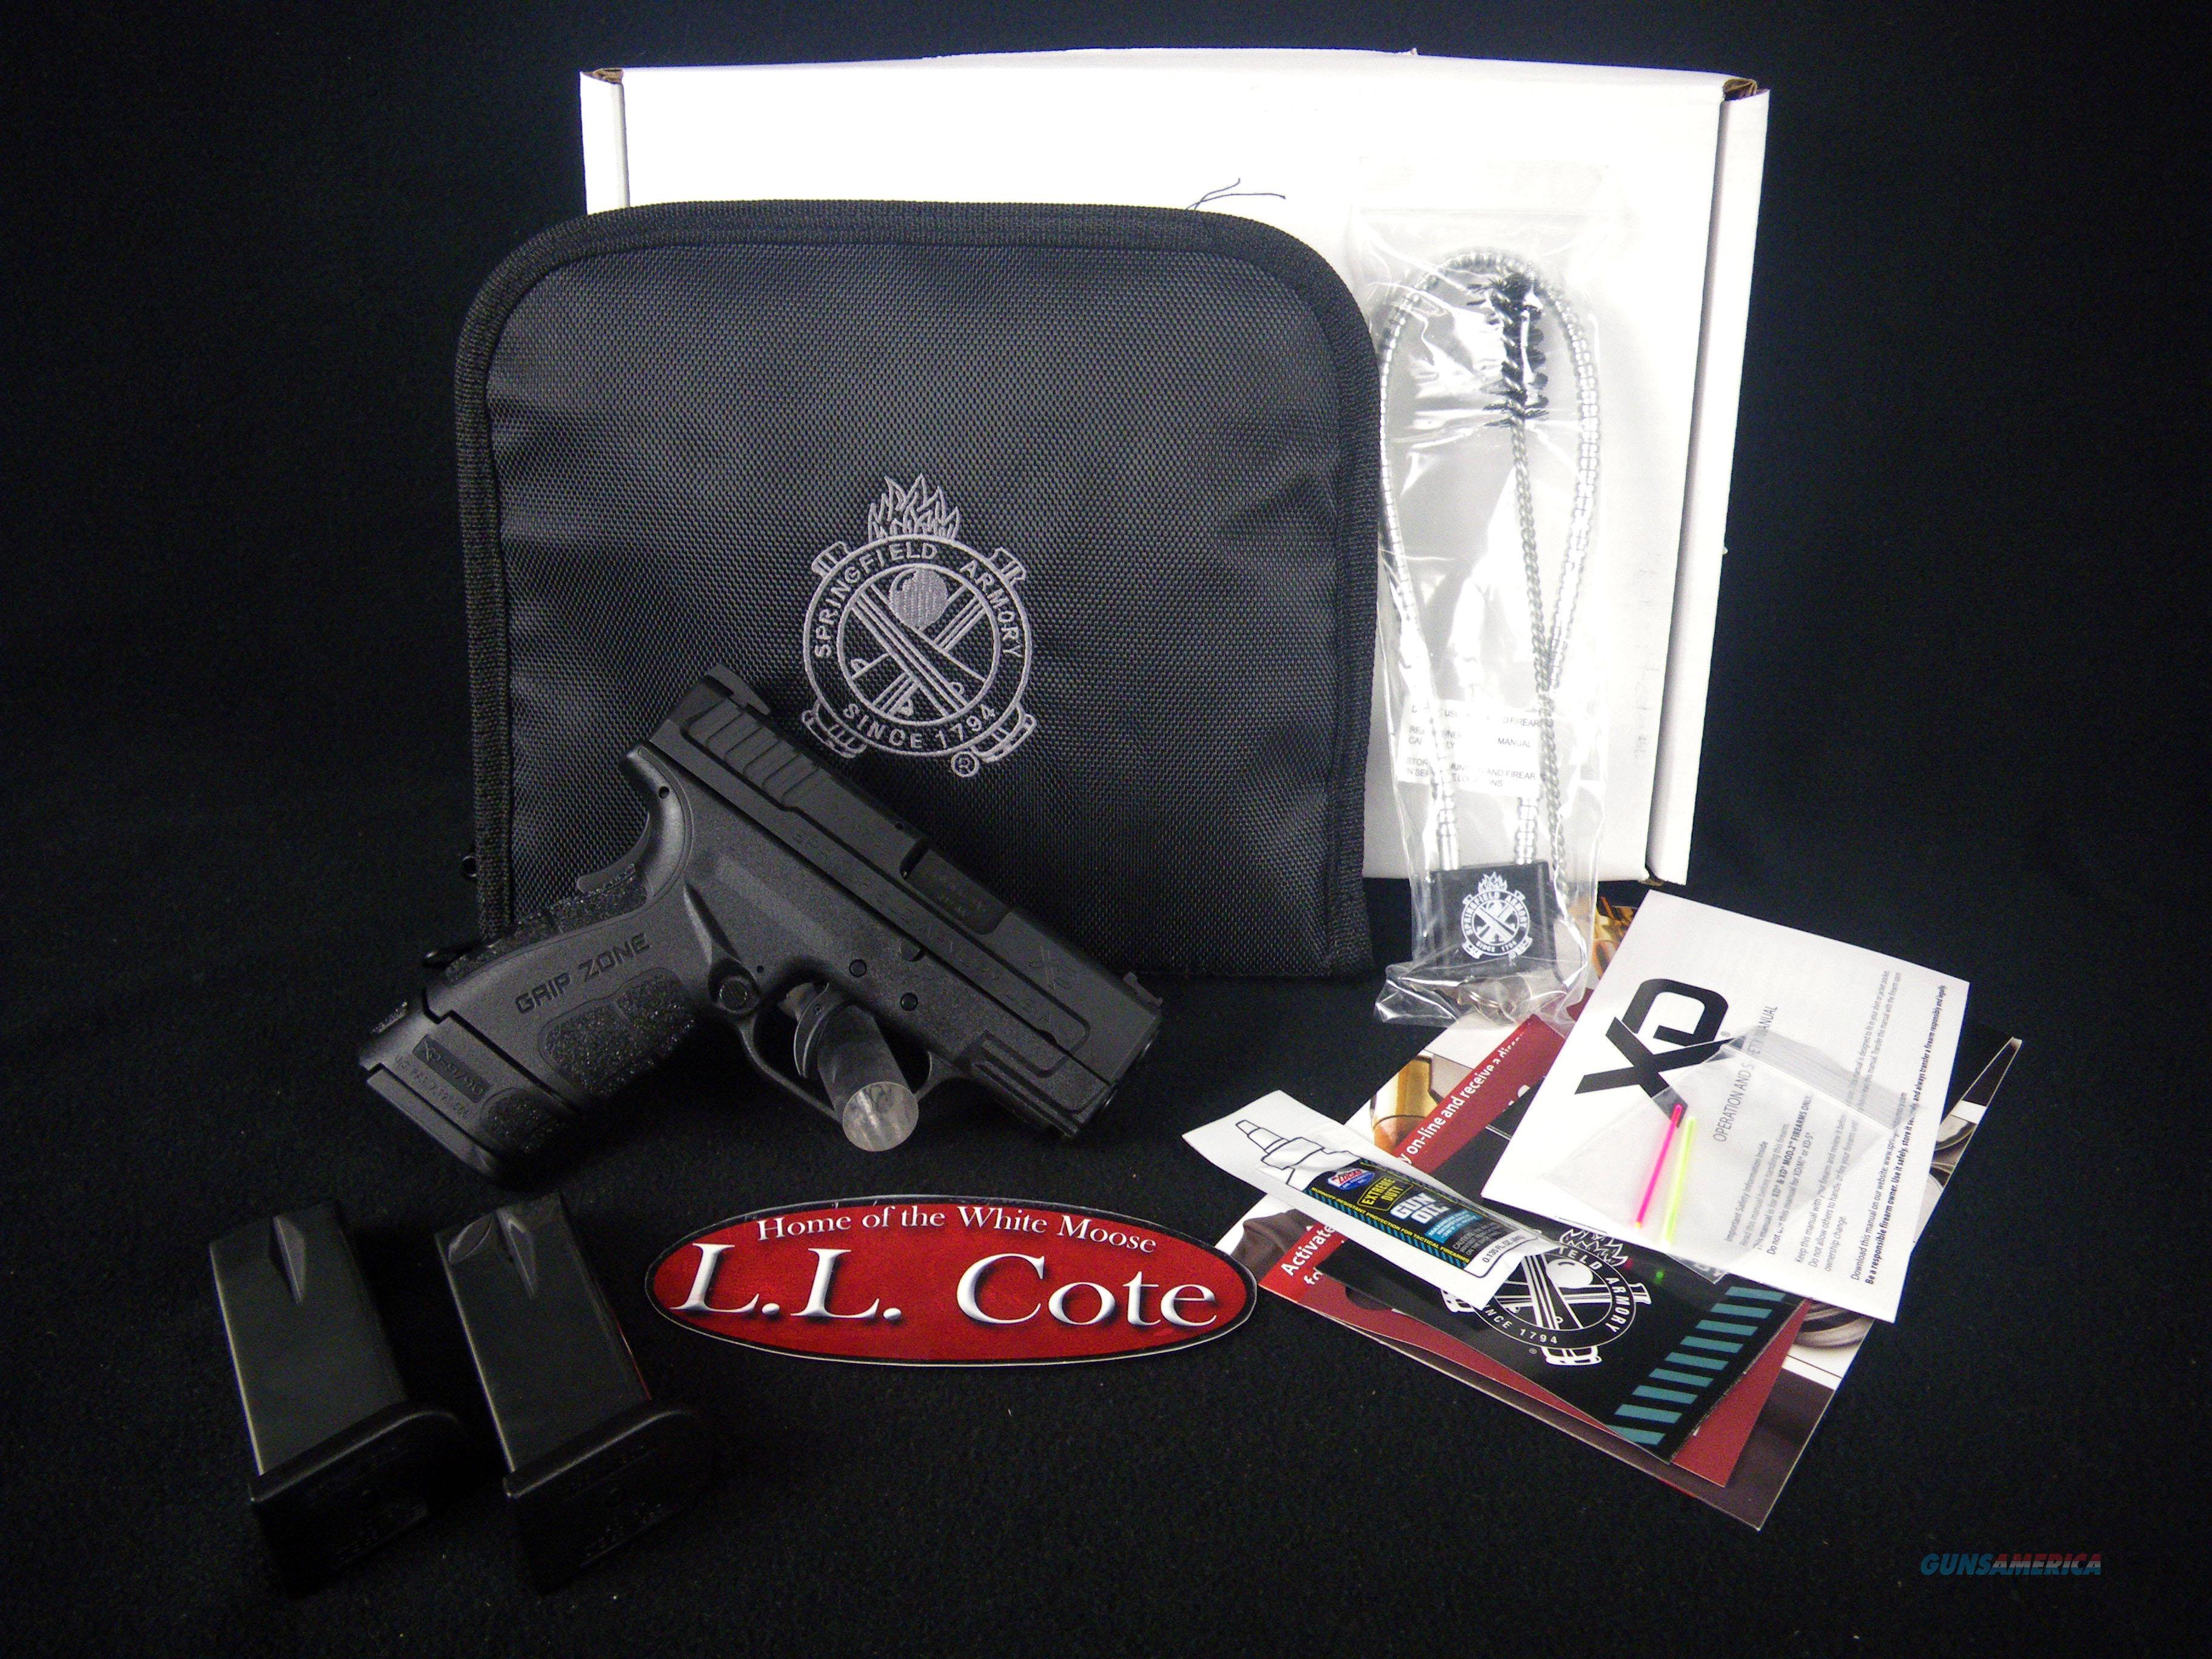 "Springfield XD Mod.2 Sub-Compact 40S&W 3"" NEW XDG9802HCN  Guns > Pistols > Springfield Armory Pistols > XD-Mod.2"